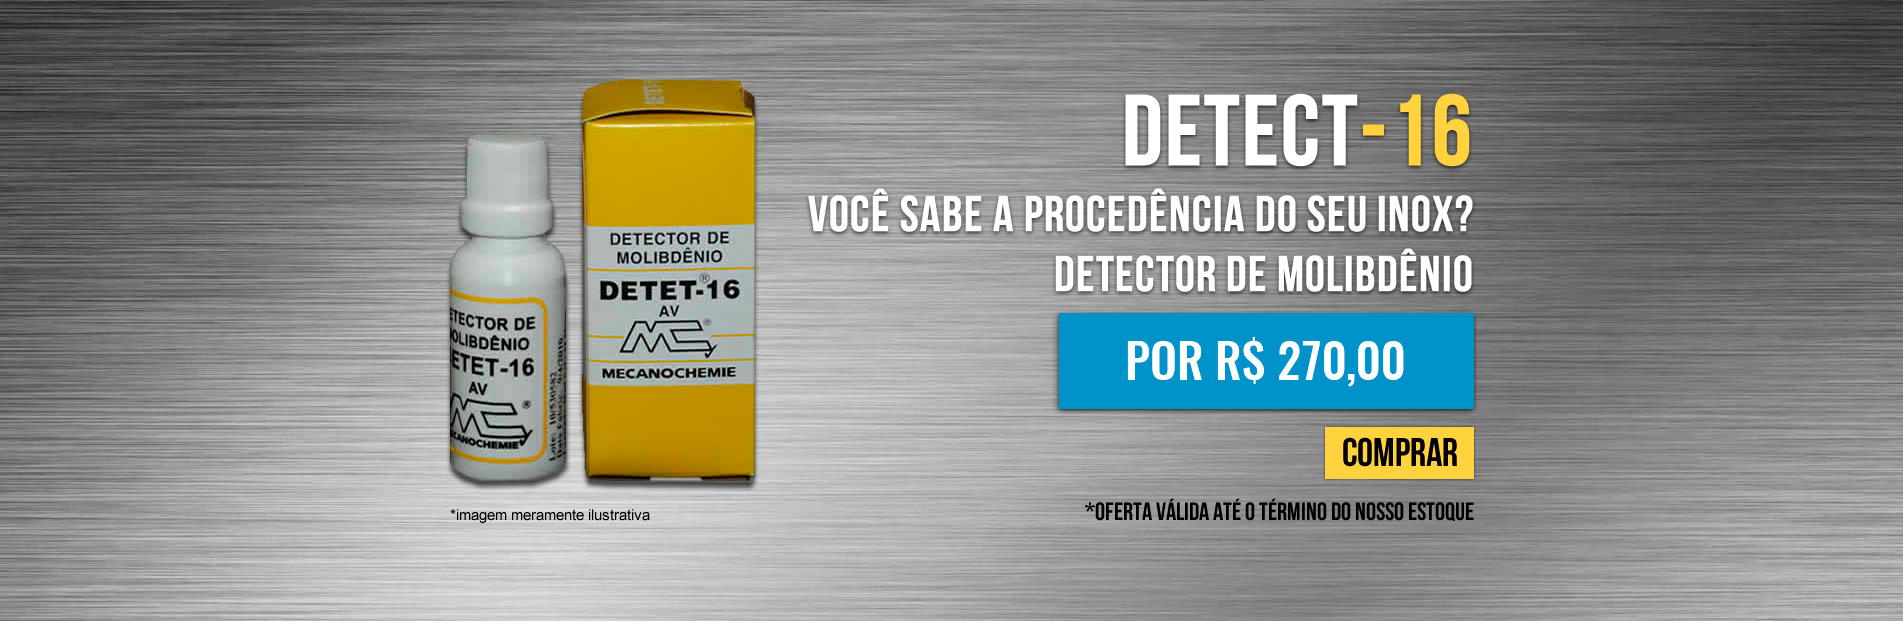 Detec-16